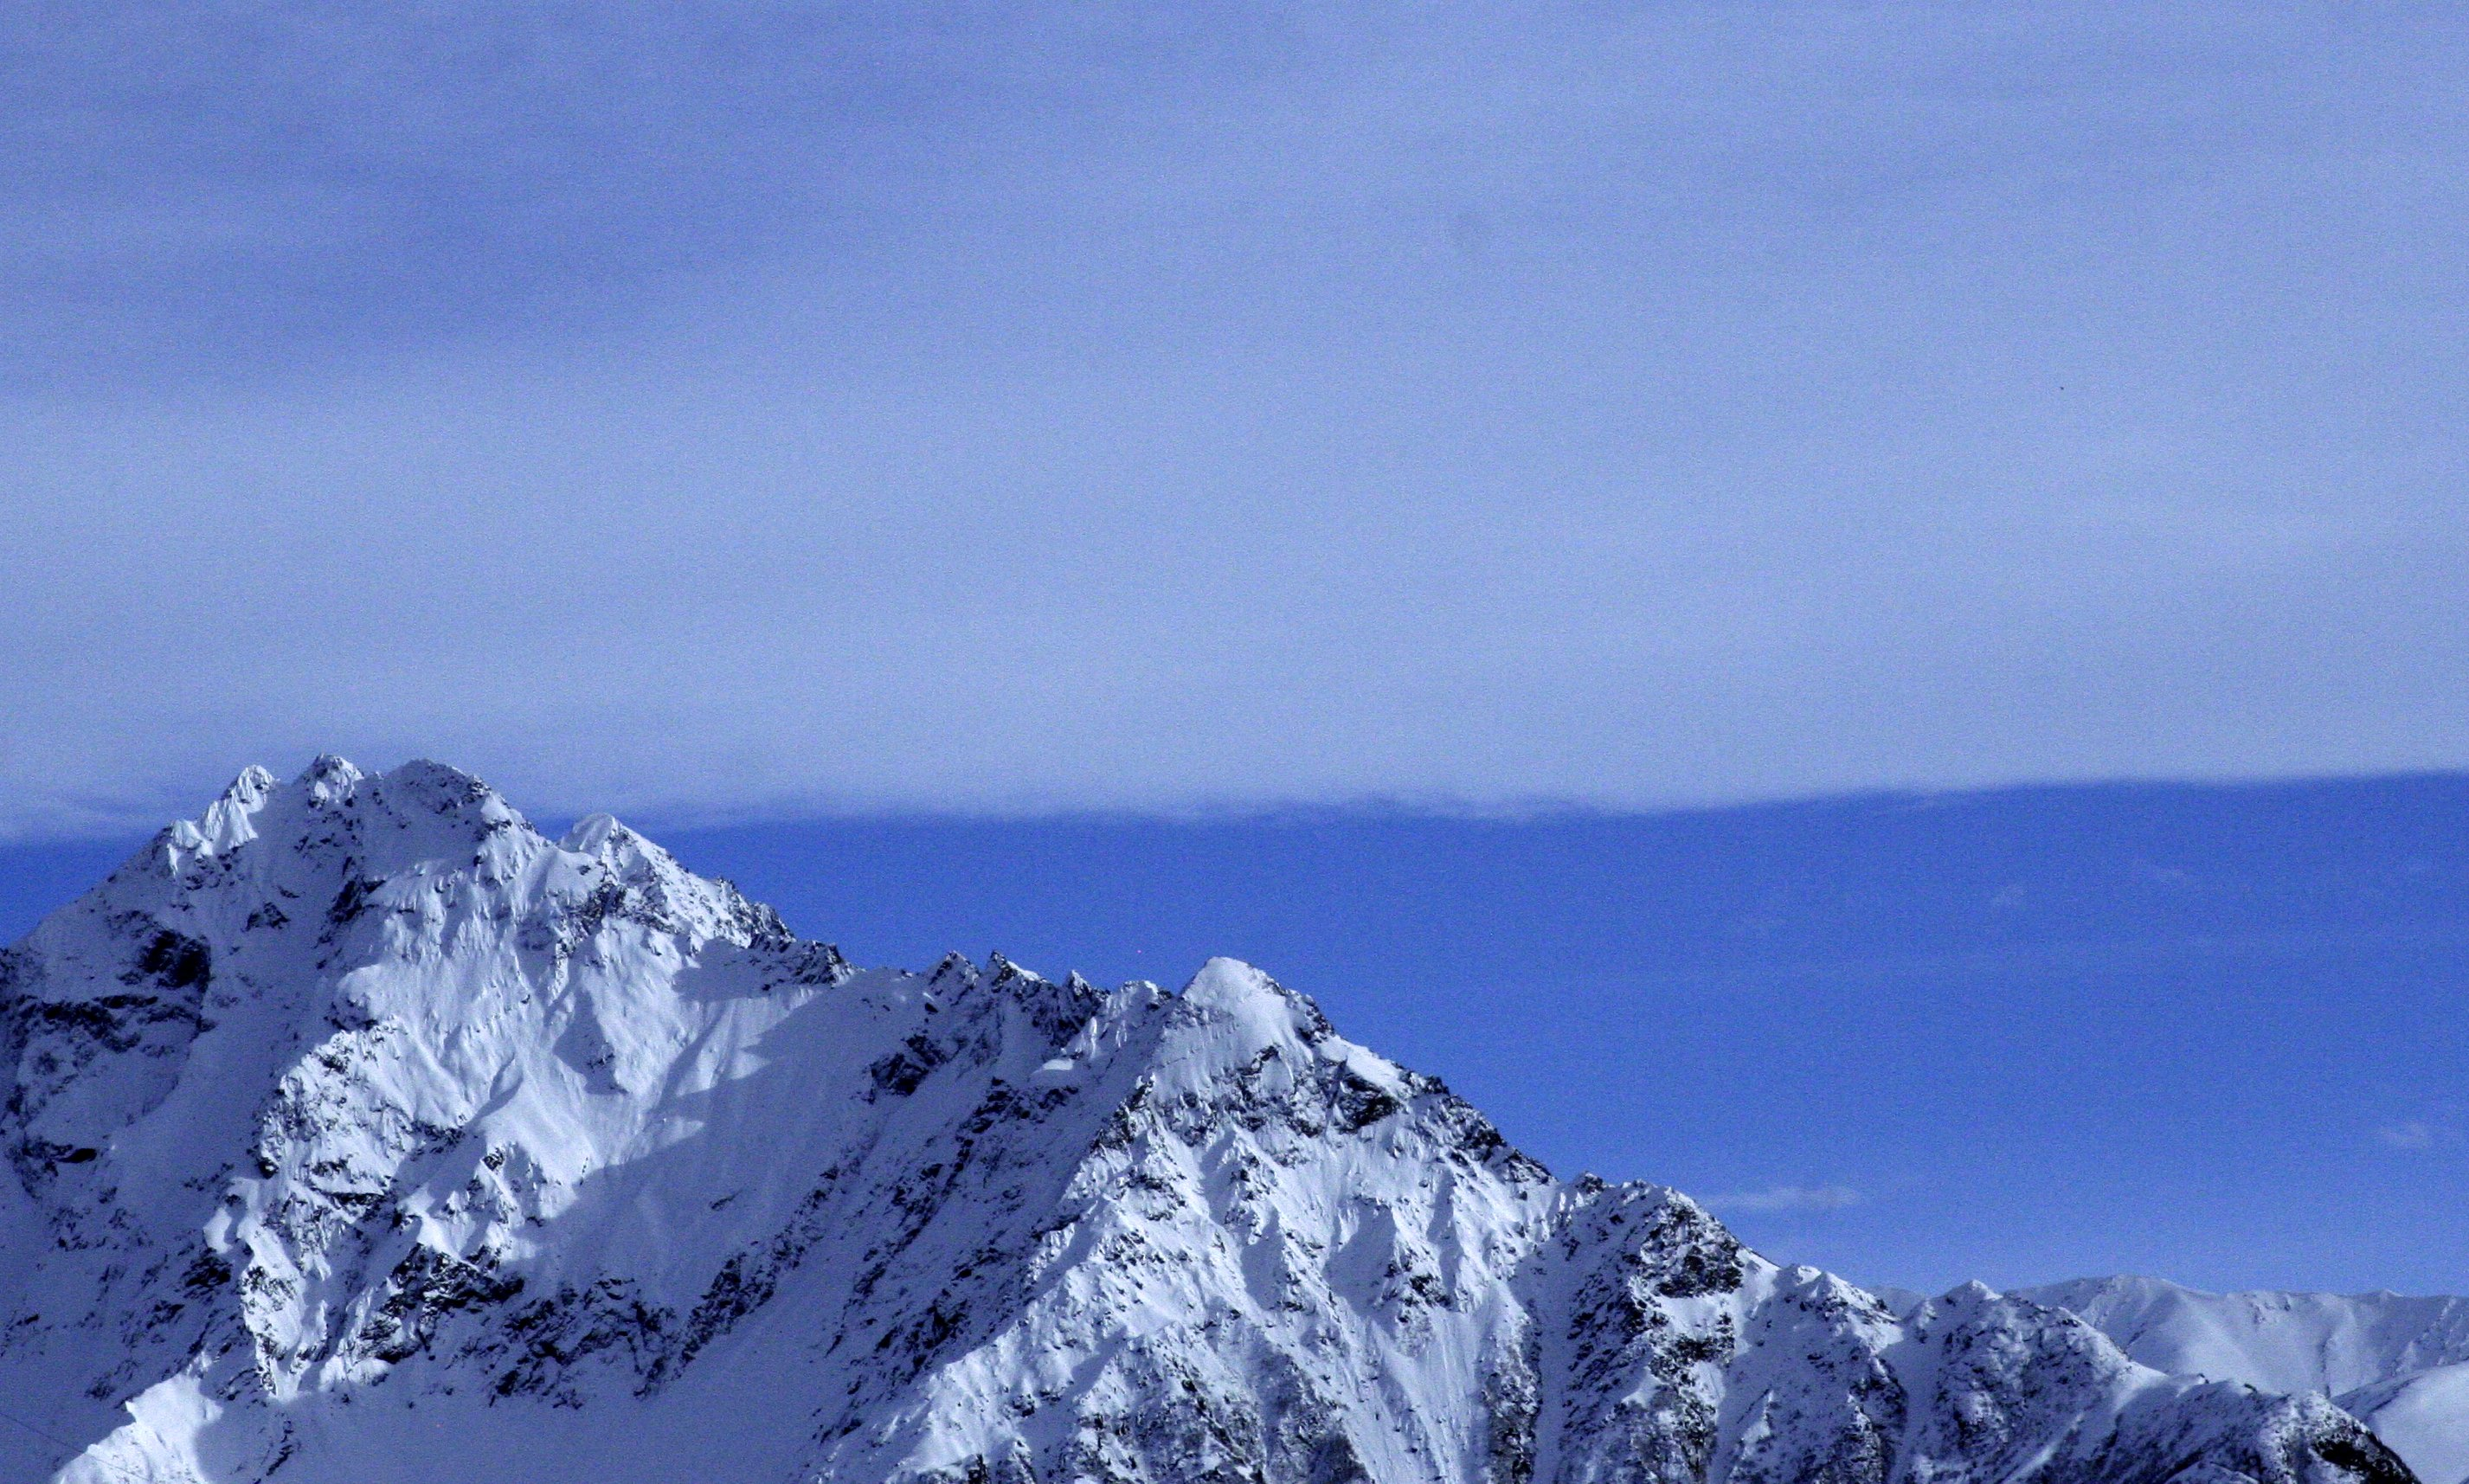 Alaska winter darkness